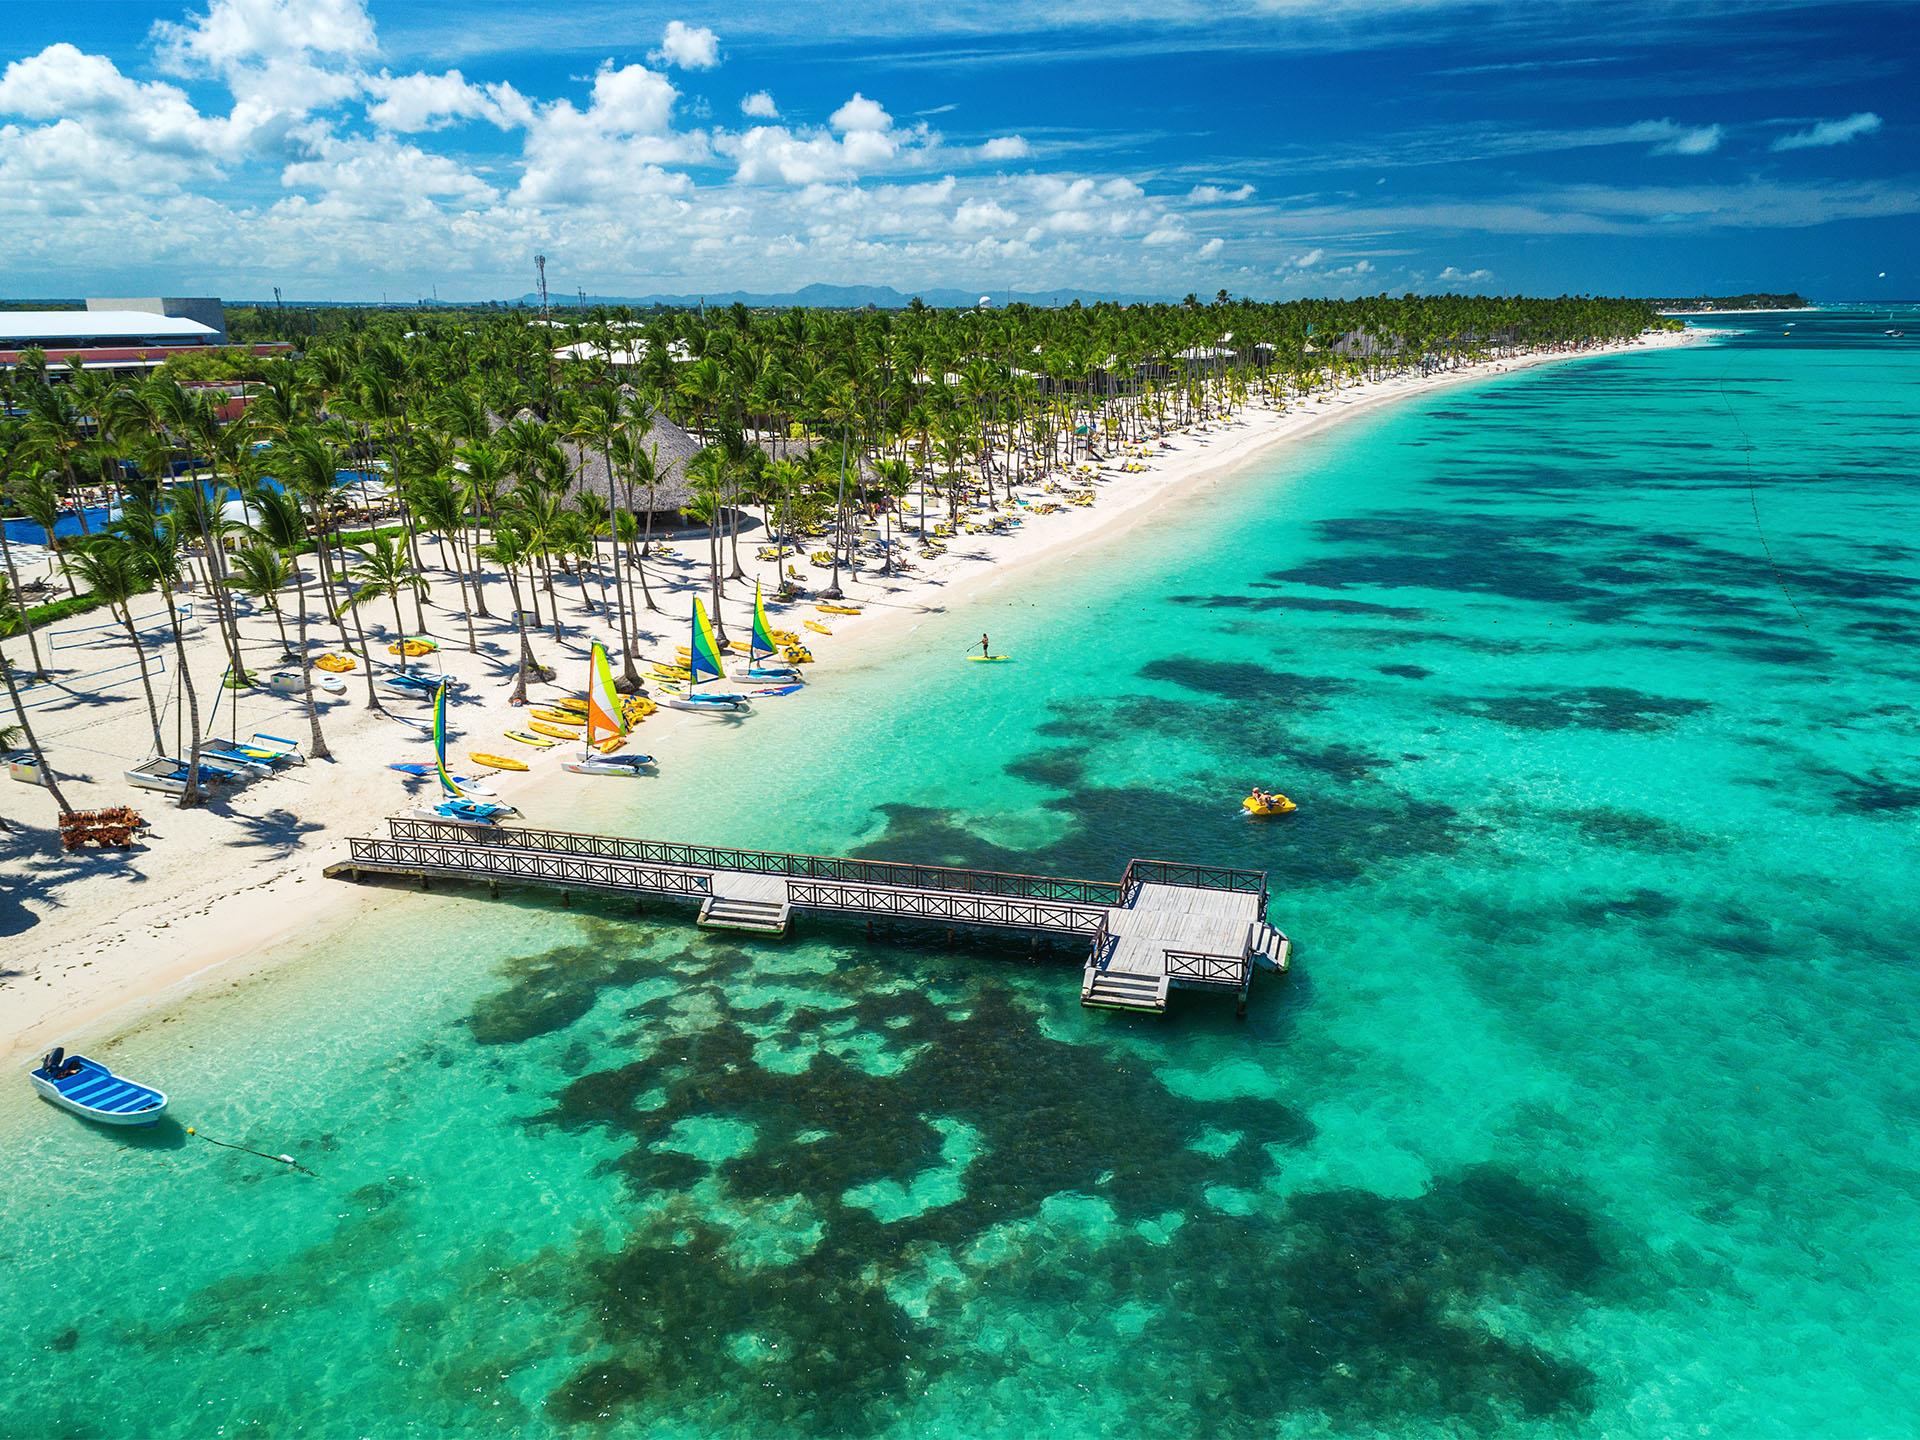 Viajes a Punta Cana Tarifas de hoteles